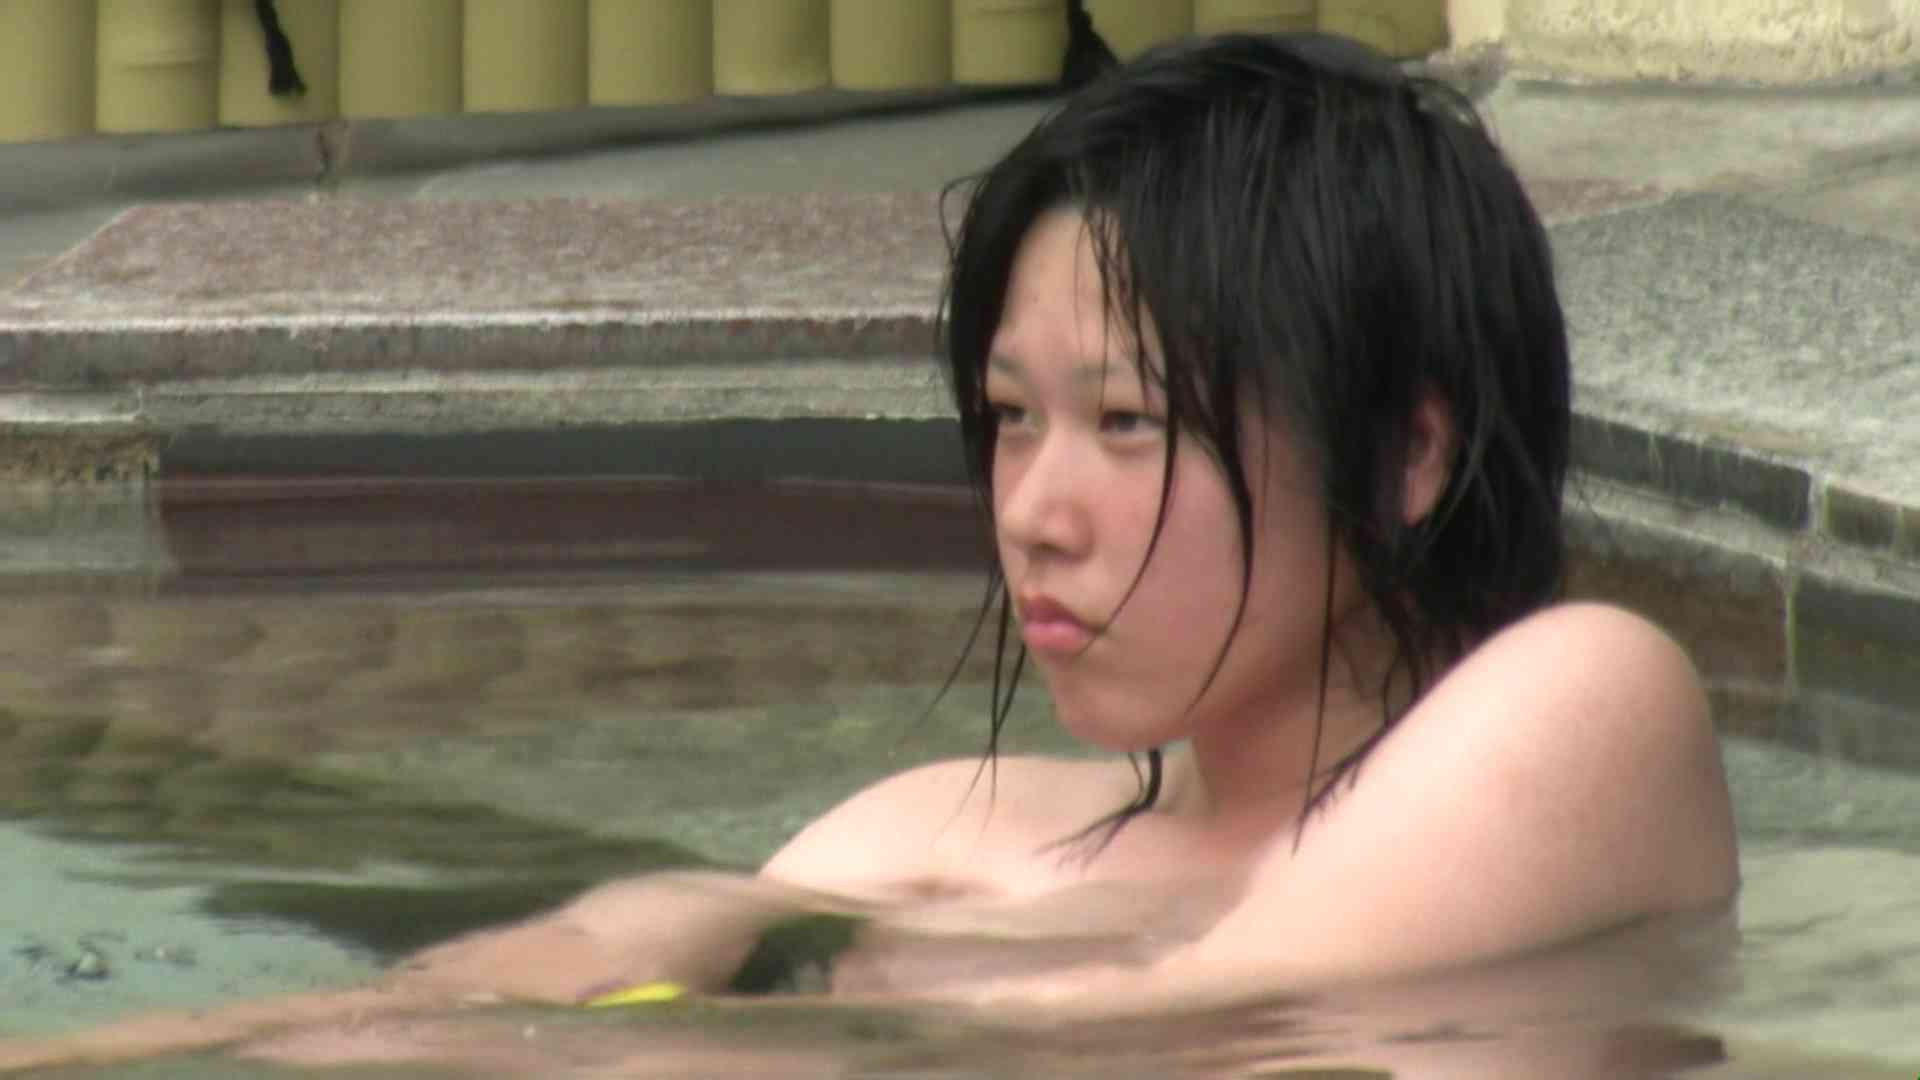 Aquaな露天風呂Vol.36 盗撮 | HなOL  68pic 65